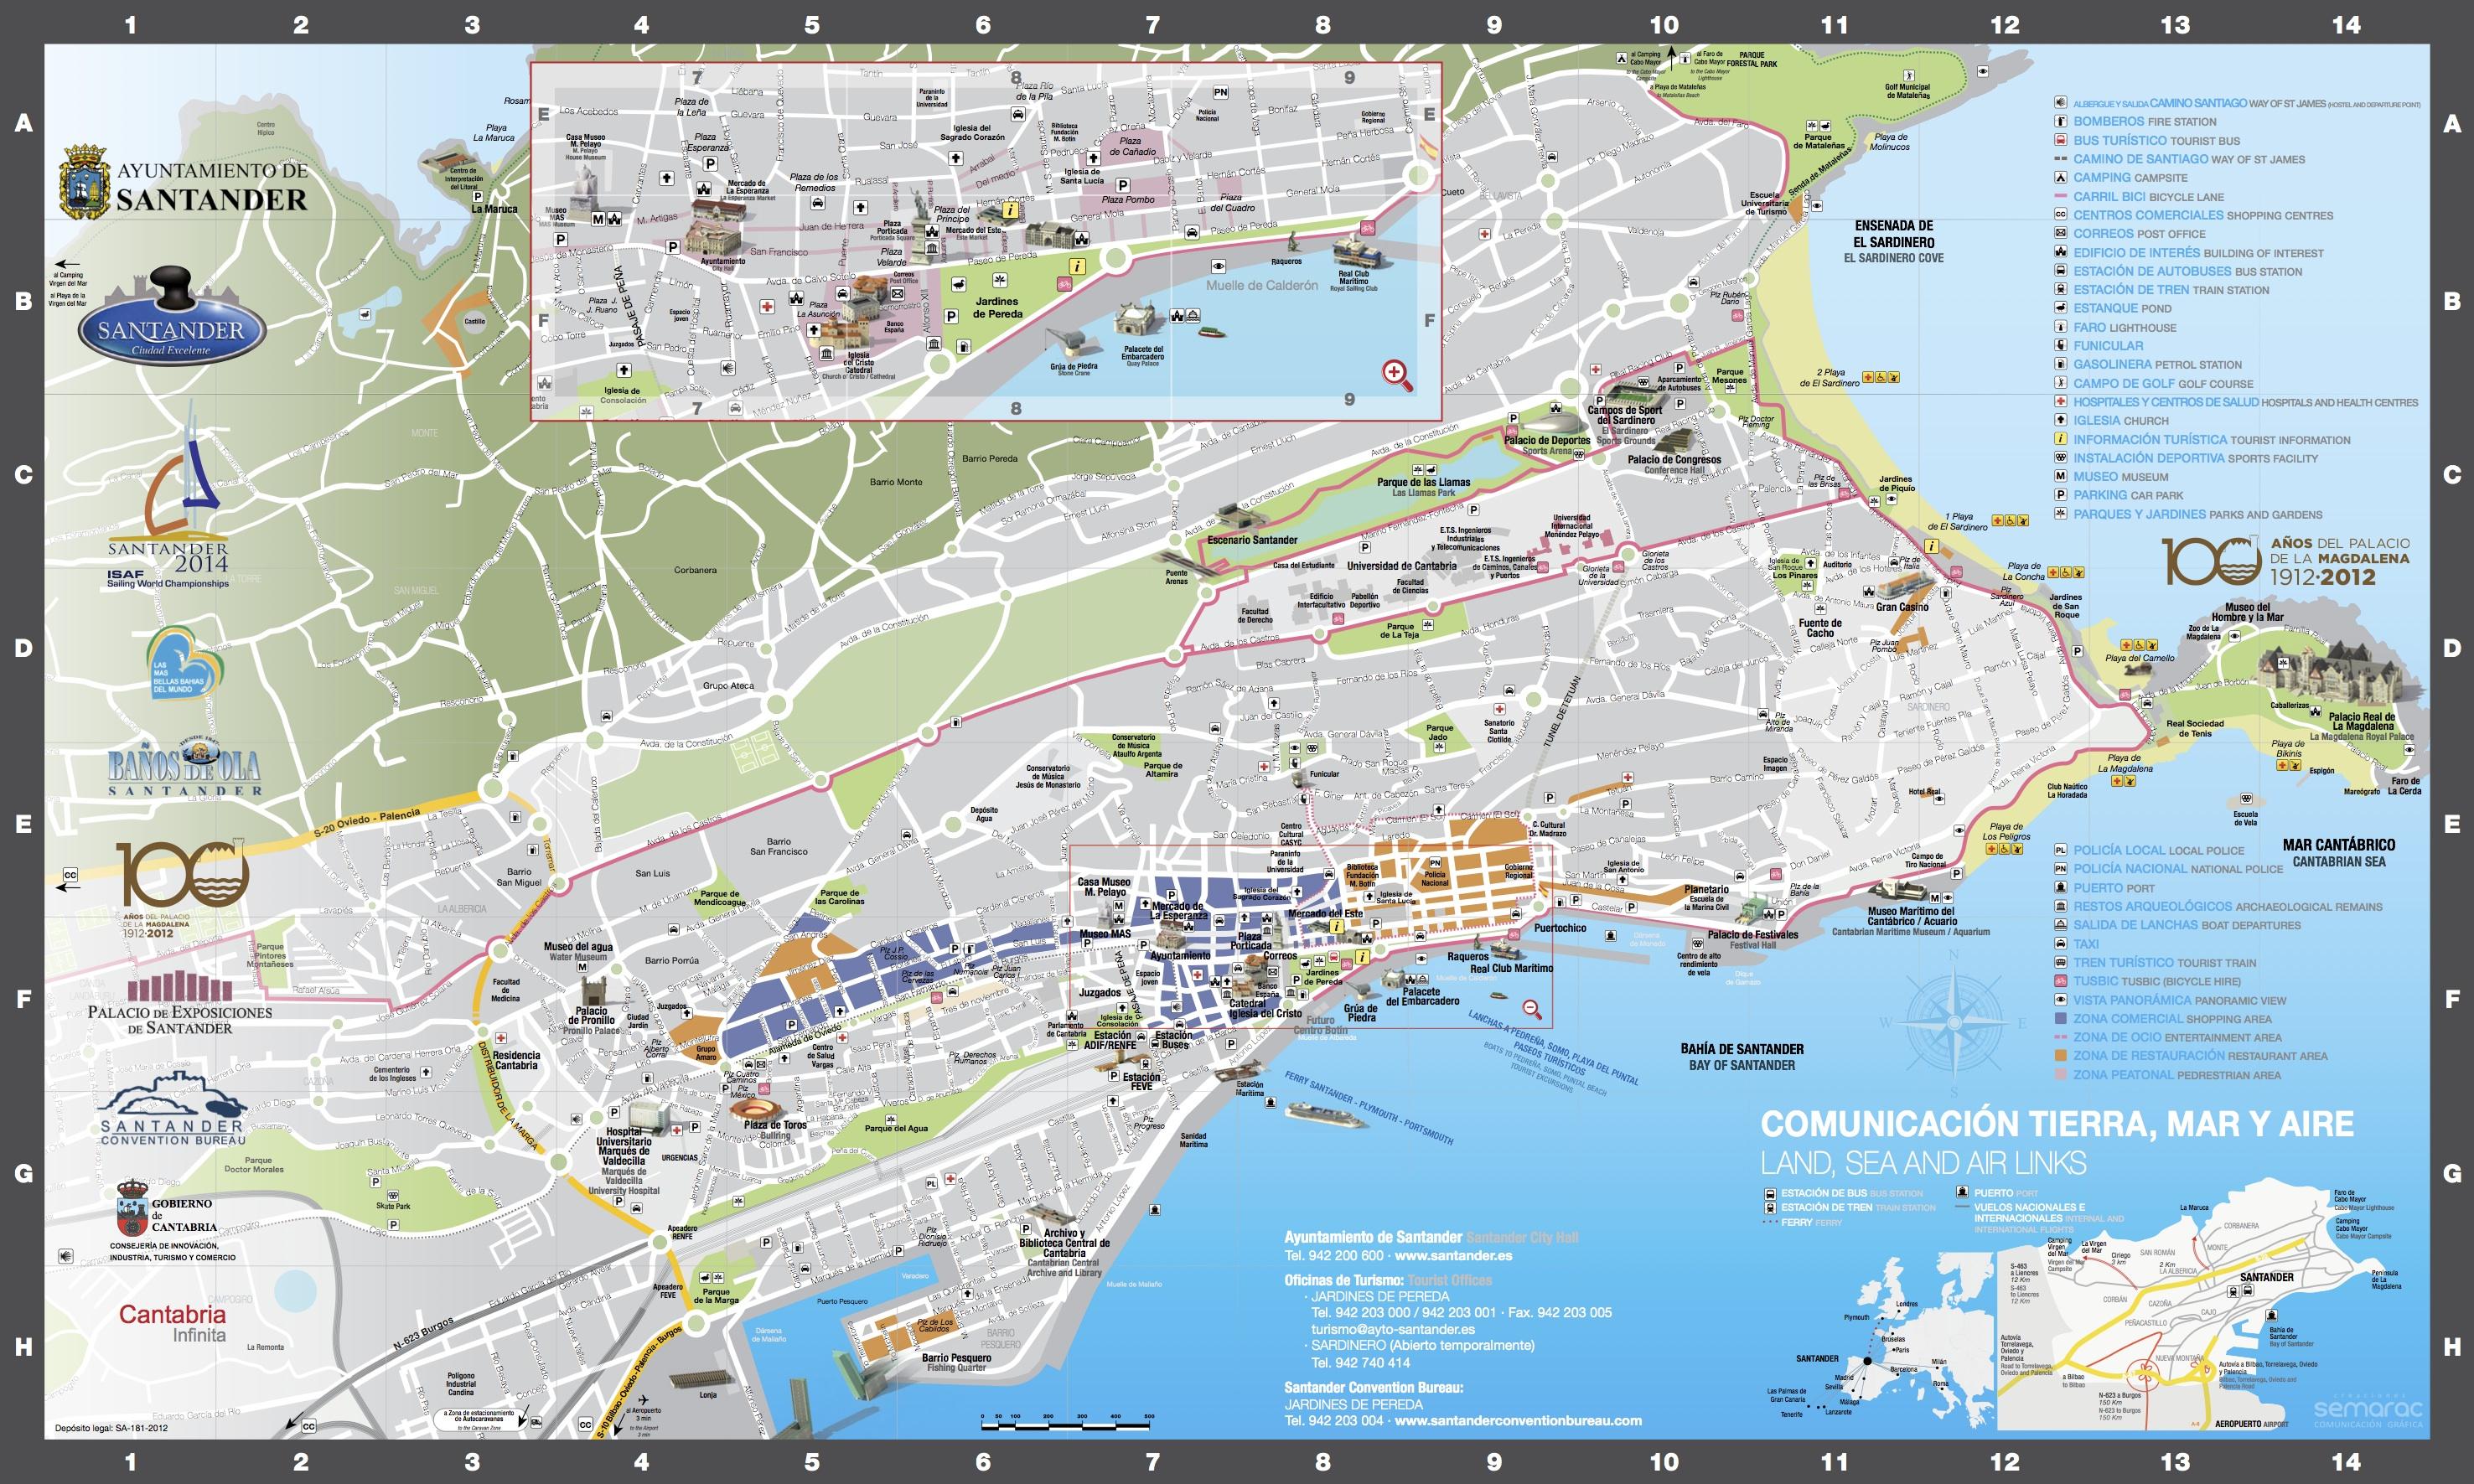 Pin mapas turisticos on pinterest for Mapa santander sucursales